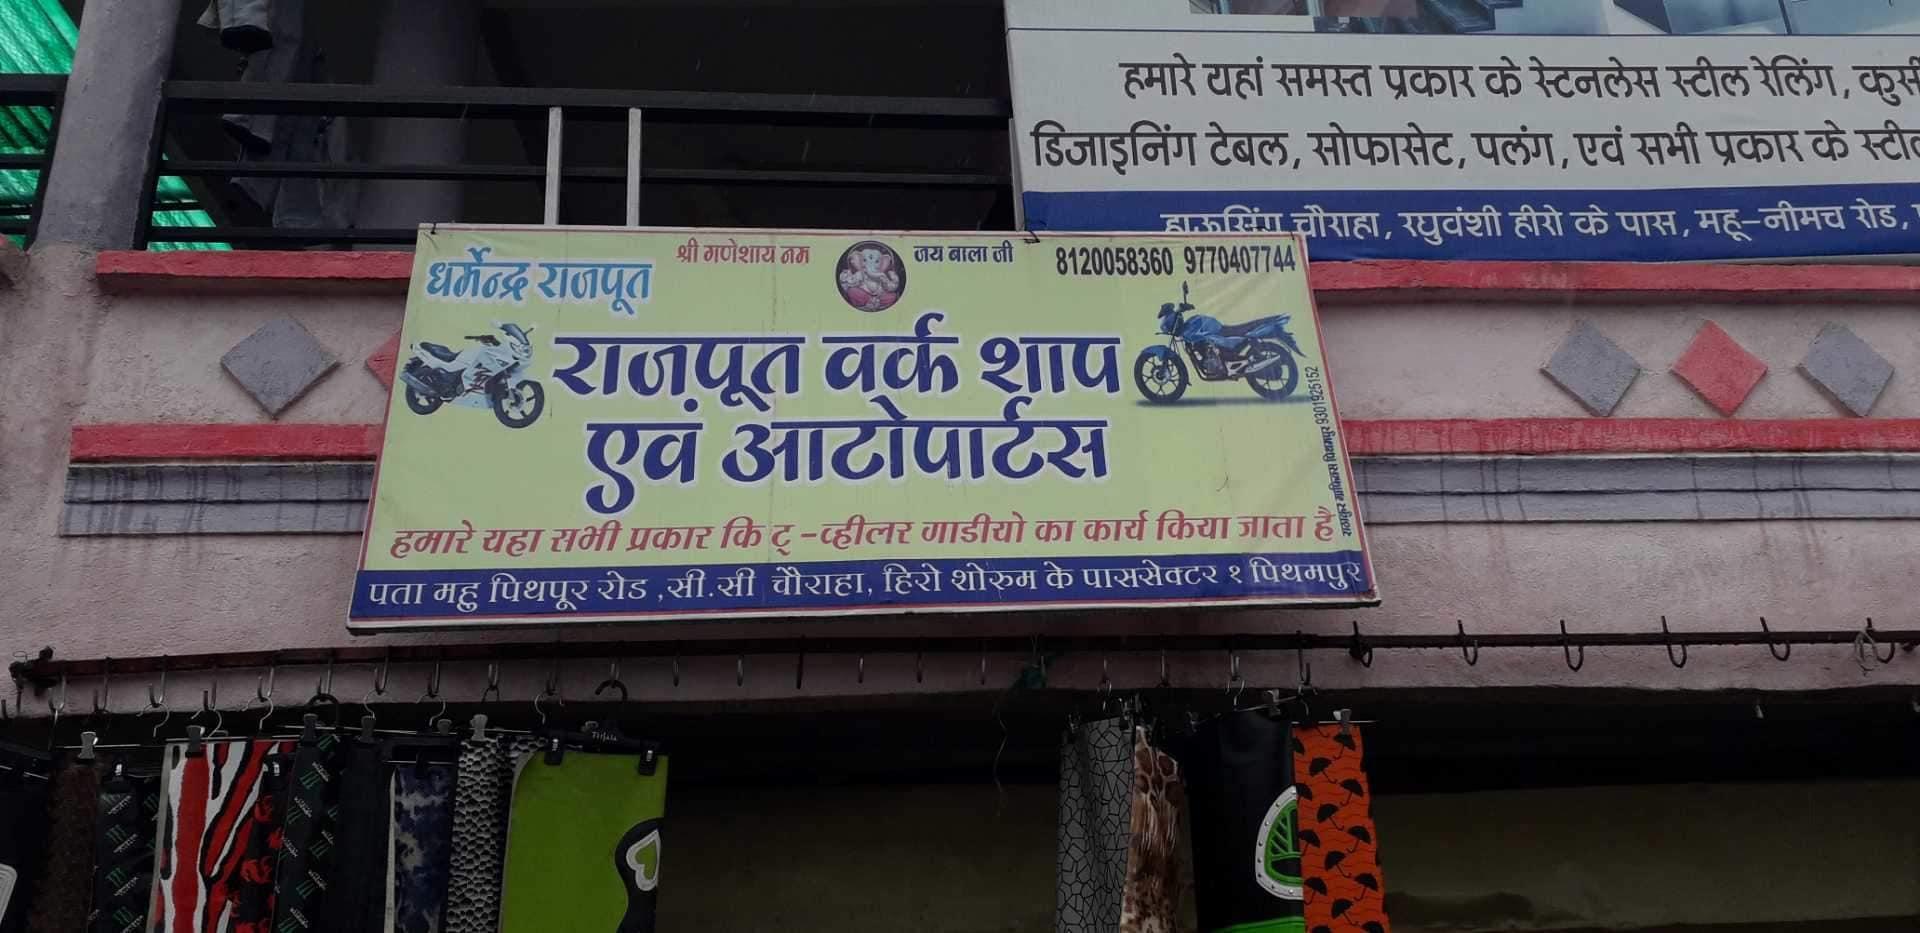 Top Yamaha Motorcycle Showrooms in Pithampur, Dhar - Yamaha